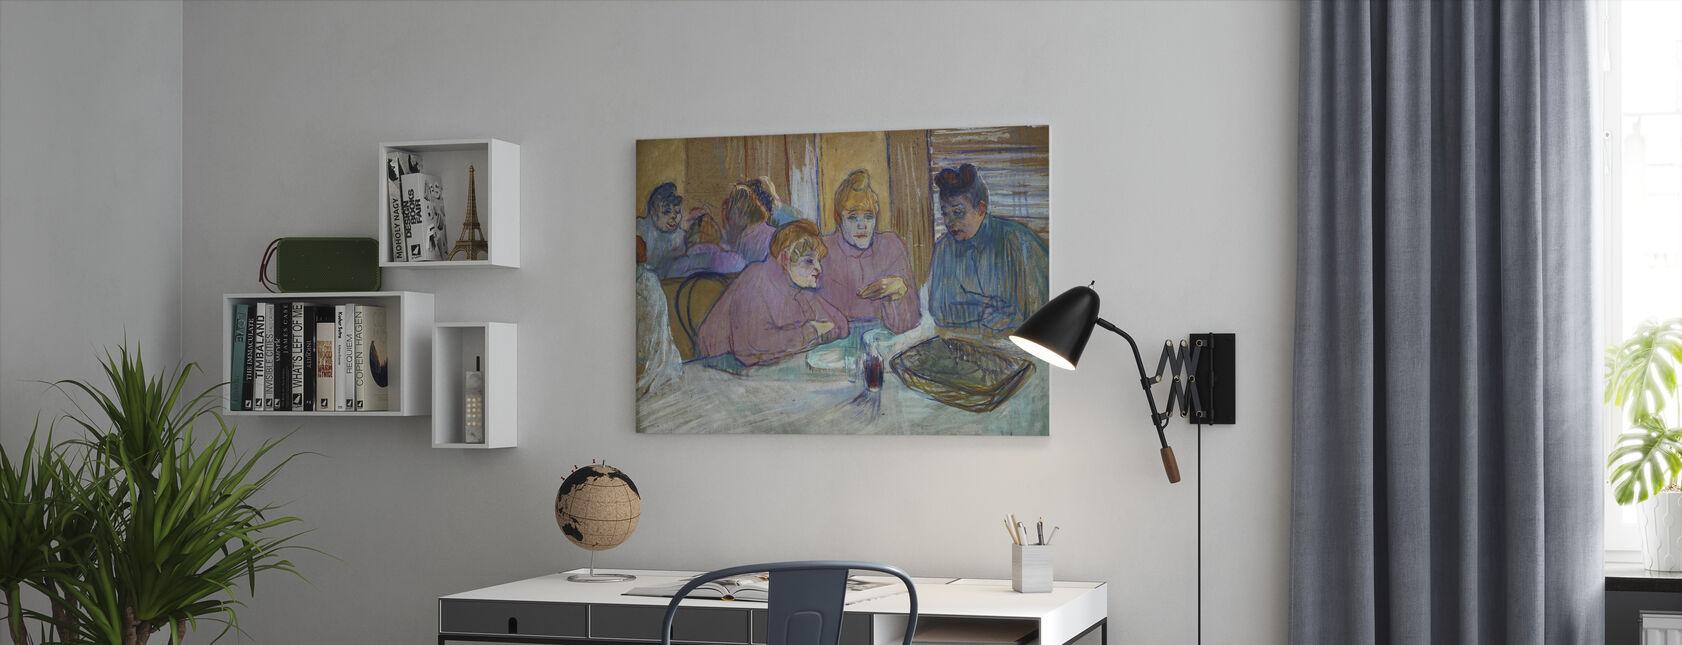 Damer - Henri de Toulouse Lautrec - Lerretsbilde - Kontor